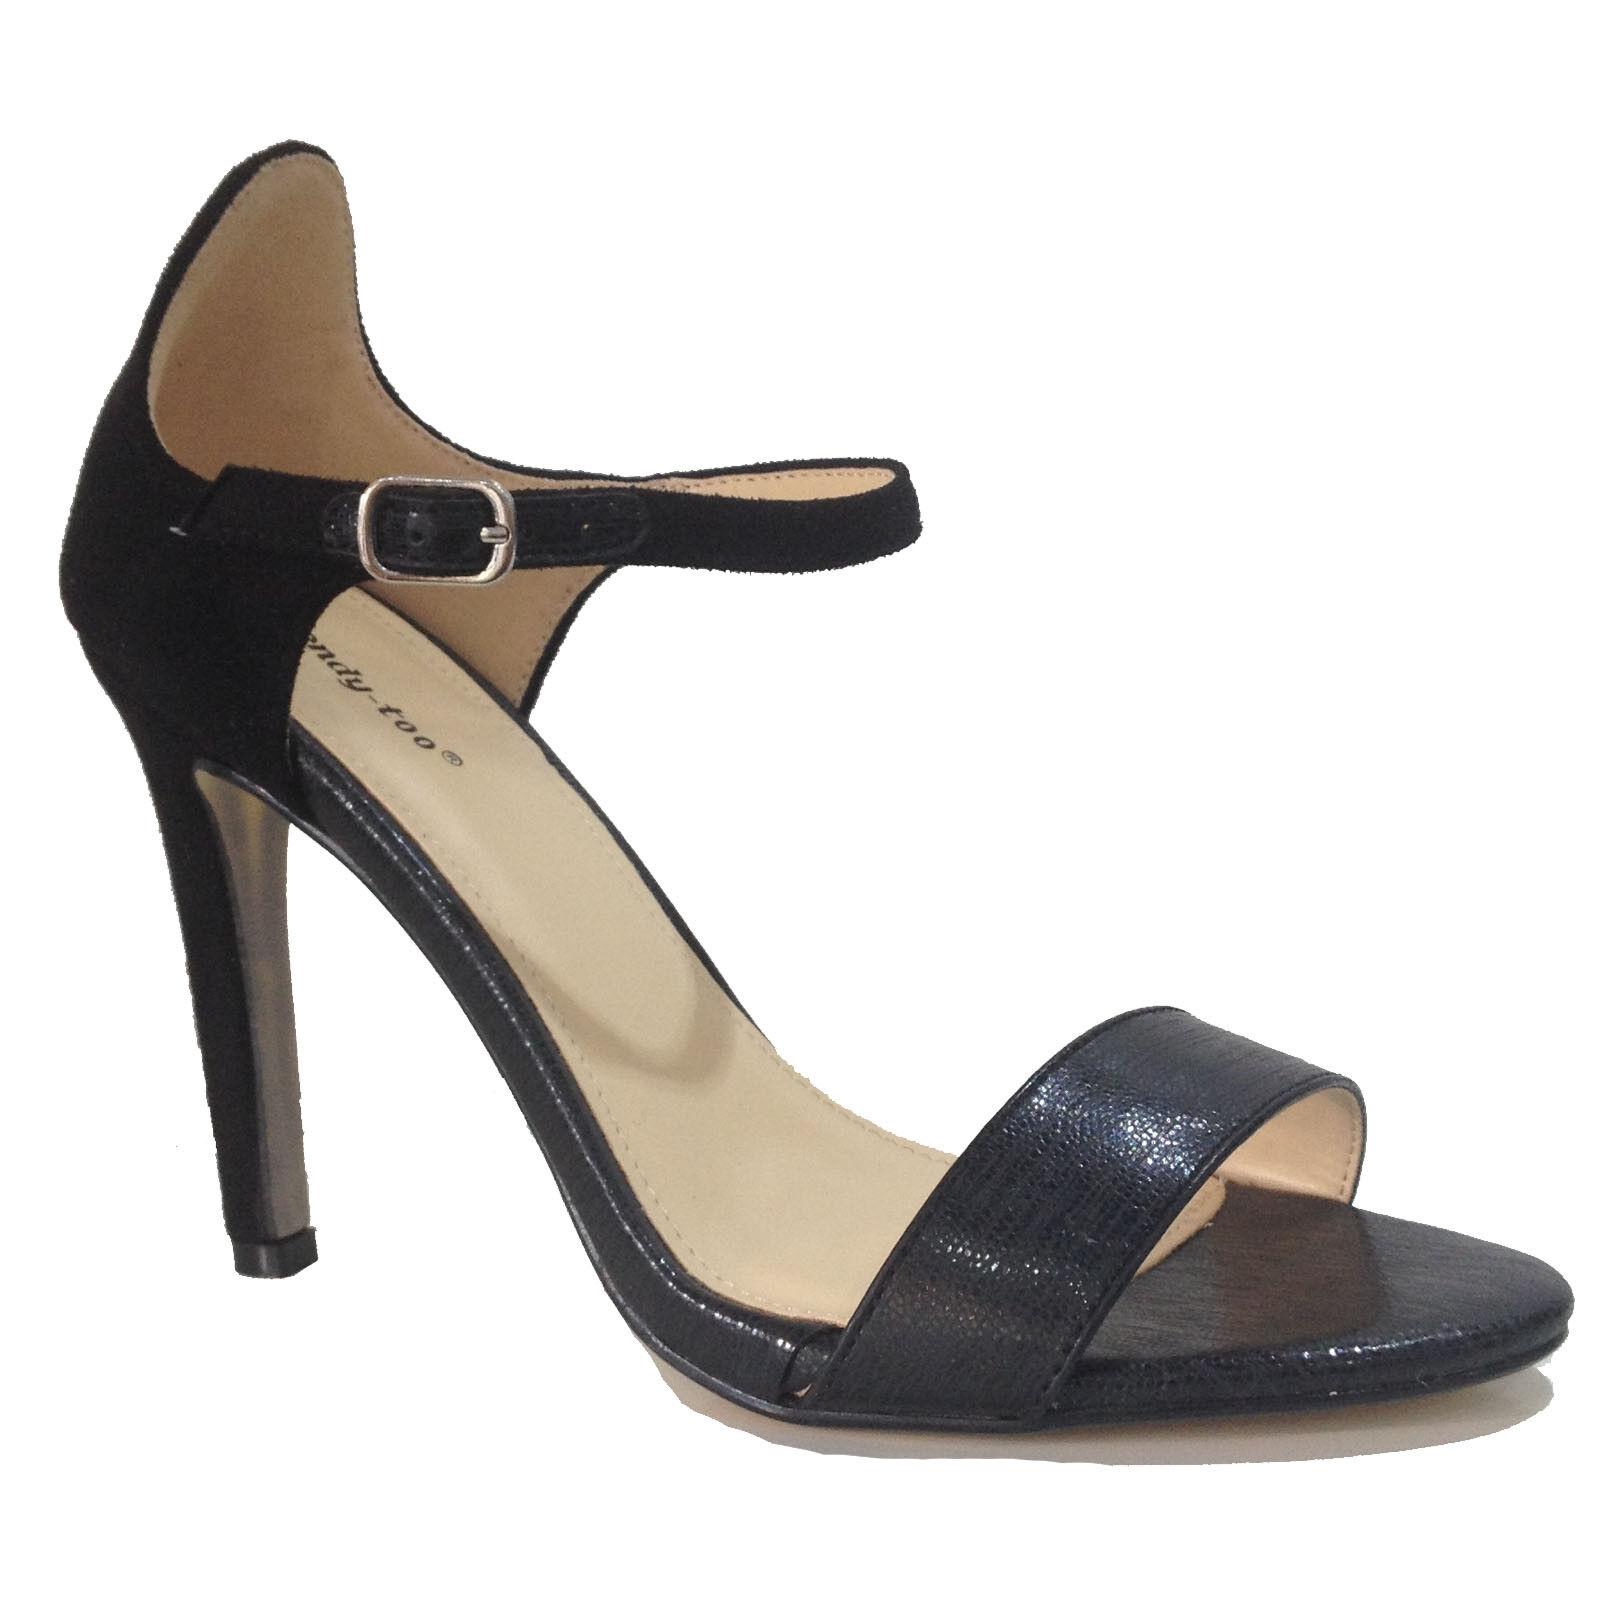 ☼ELEN☼ Sandales à talon - TRENDY TOO - Ref: 0893